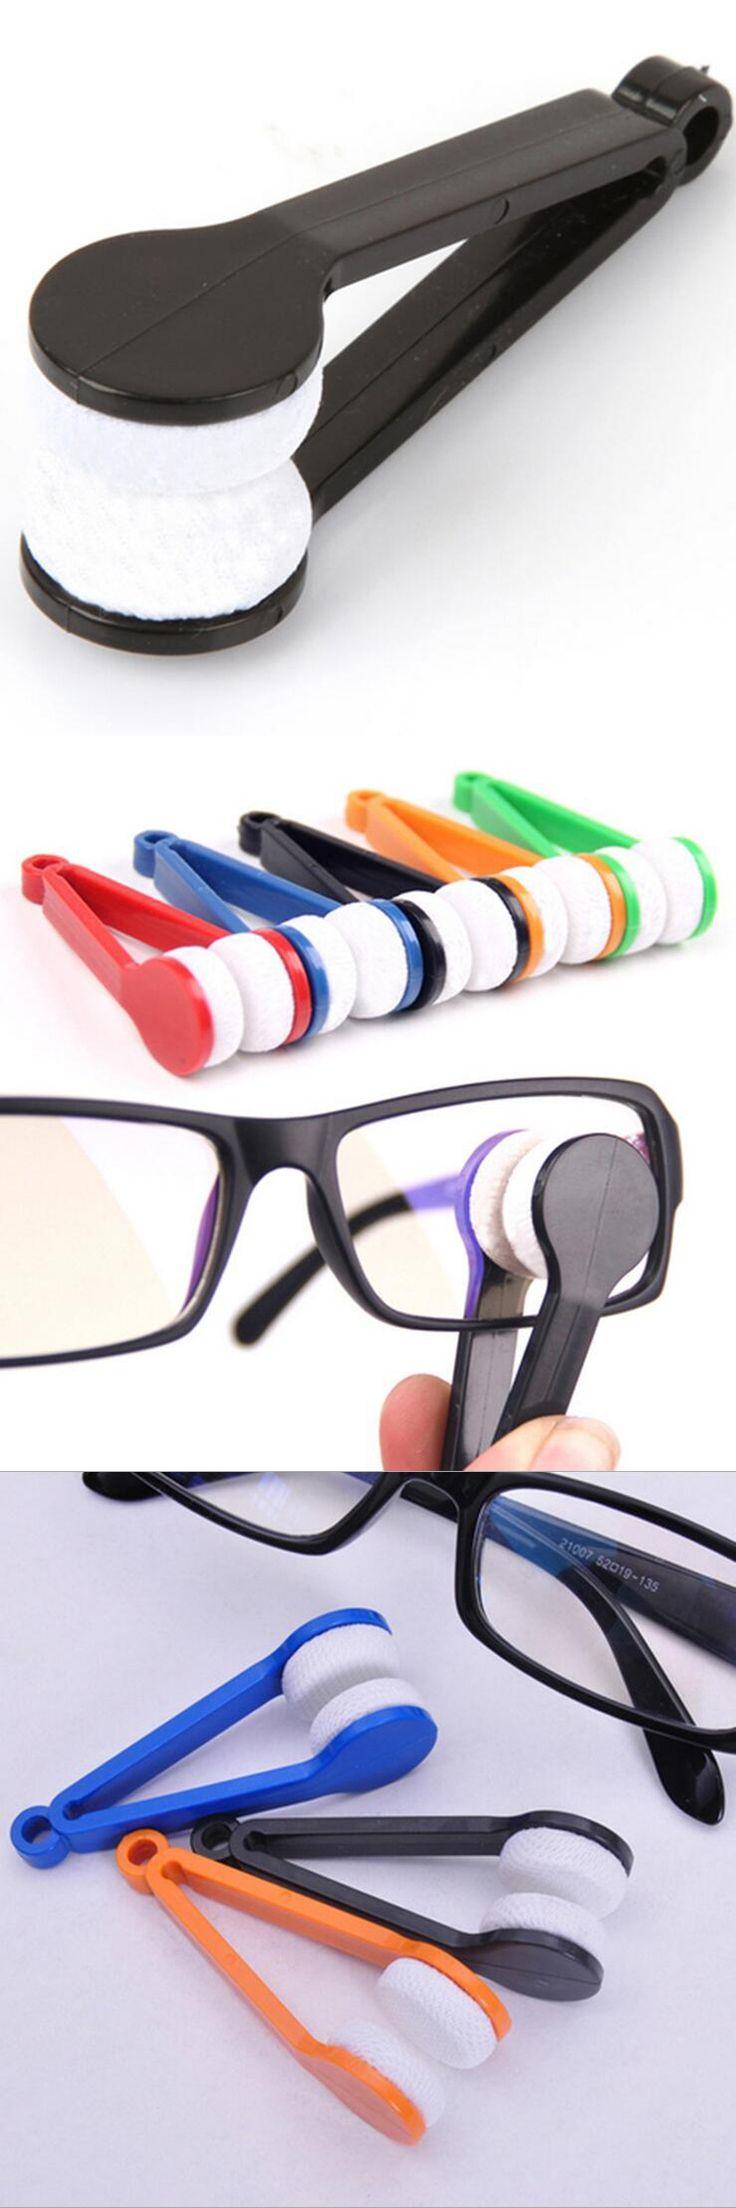 2017 Brand New Creative Mini Microfibre Glasses Cleaner Spectacles Sunglasses Eyeglass Clean Wipe Tools Mini Portable XHH05323